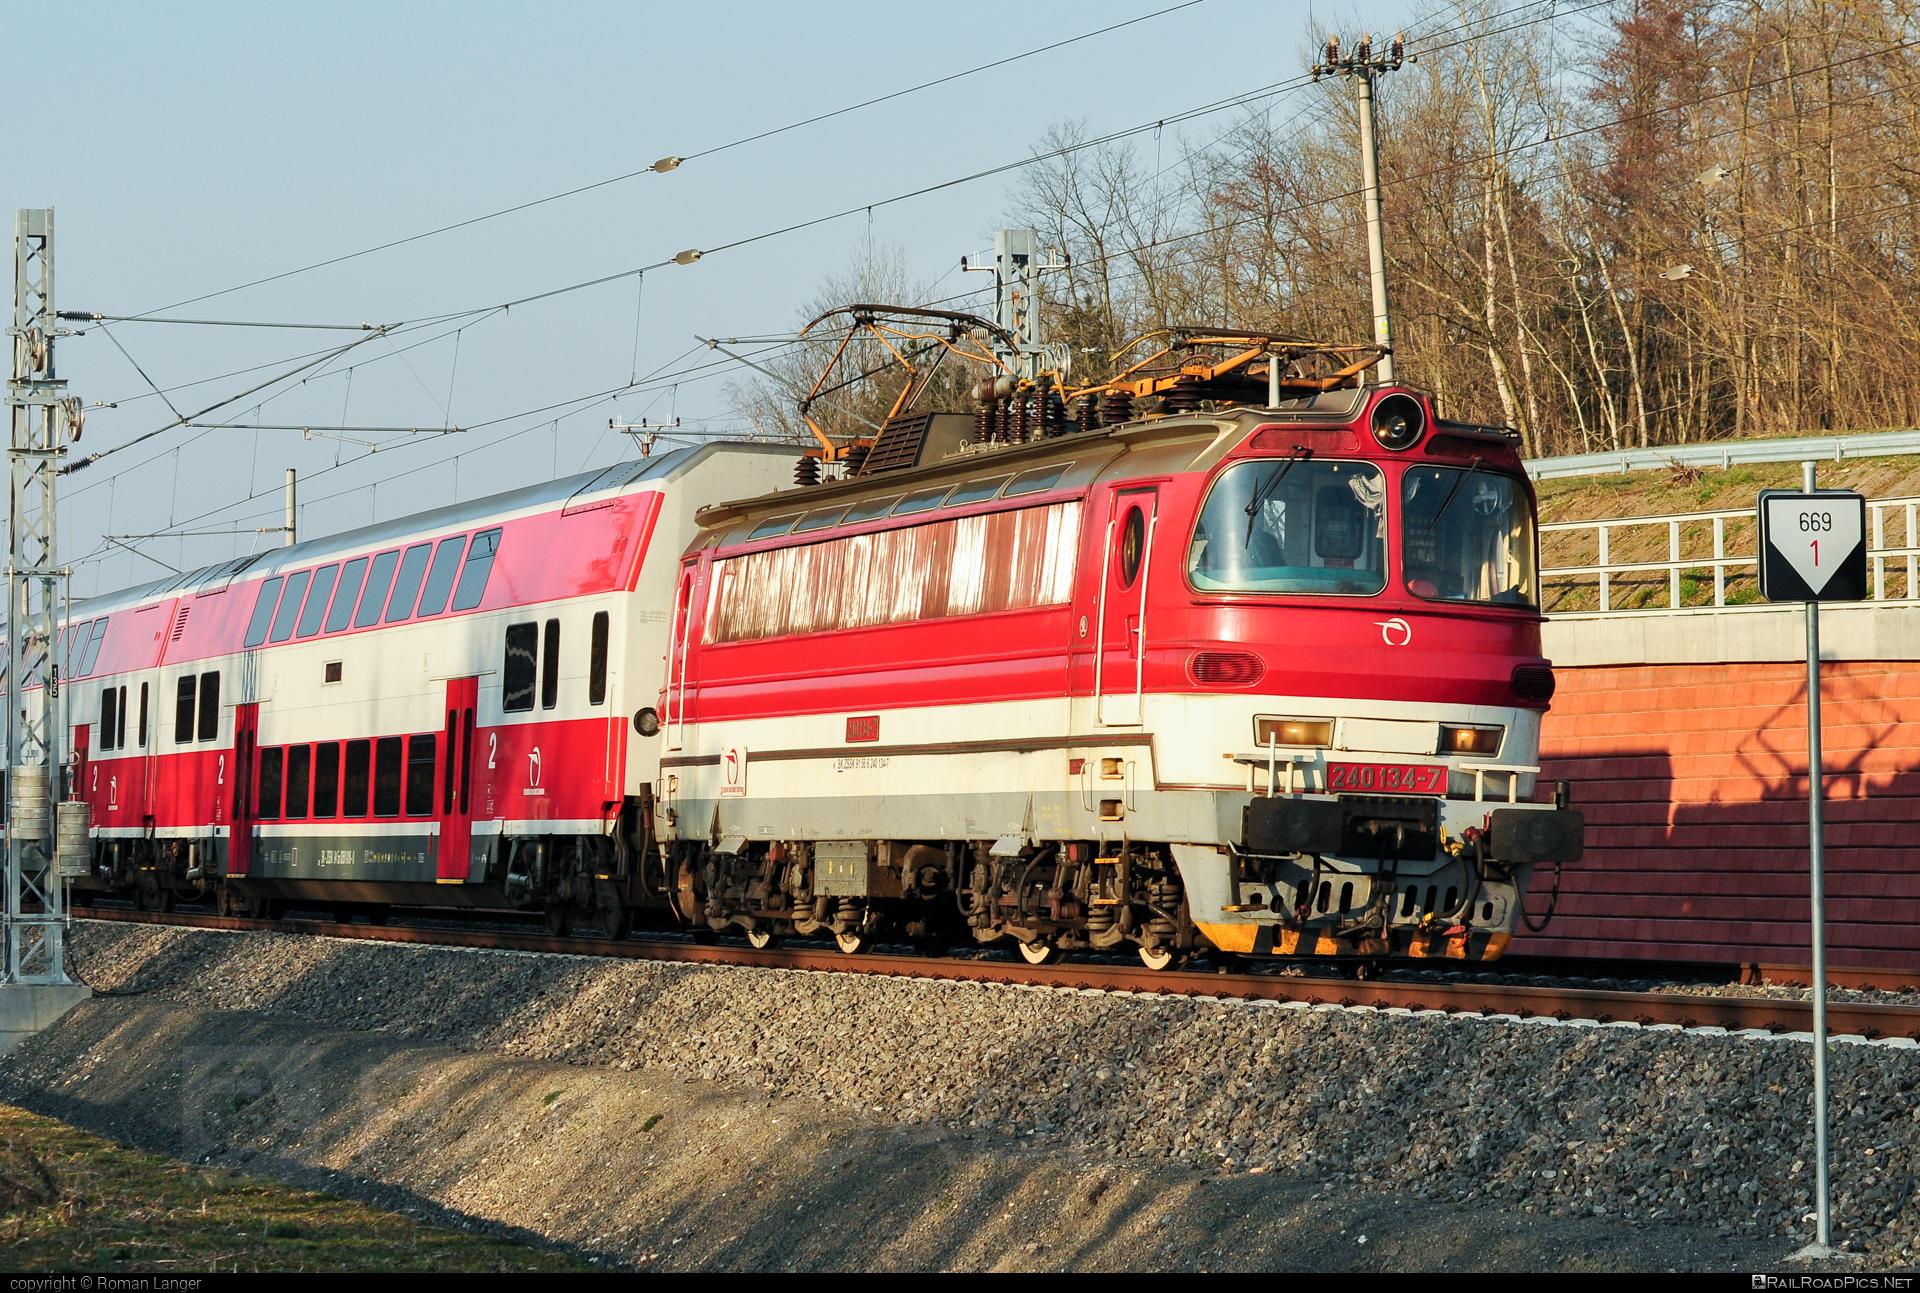 Škoda 47E - 240 134-7 operated by Železničná Spoločnost' Slovensko, a.s. #ZeleznicnaSpolocnostSlovensko #laminatka #locomotive240 #skoda #skoda47e #zssk